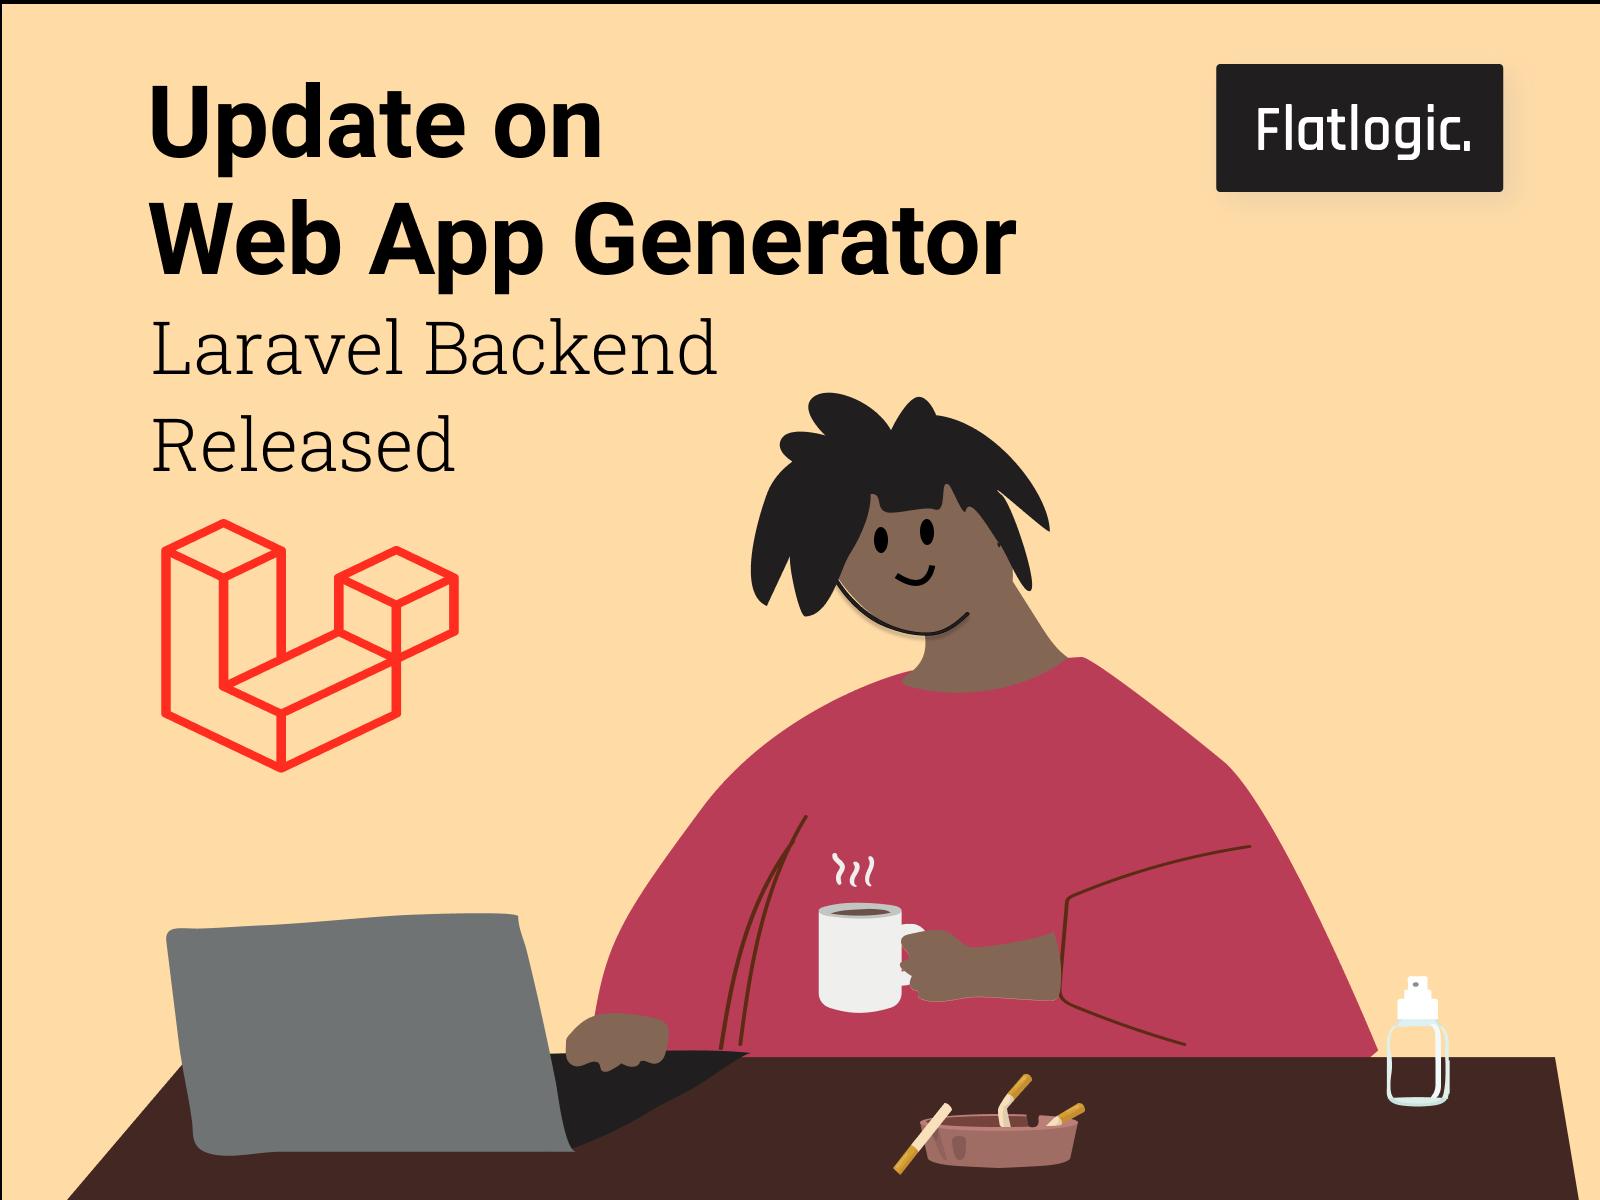 The Next Update on Flatlogic Web App Generator; Vol. 2 💥